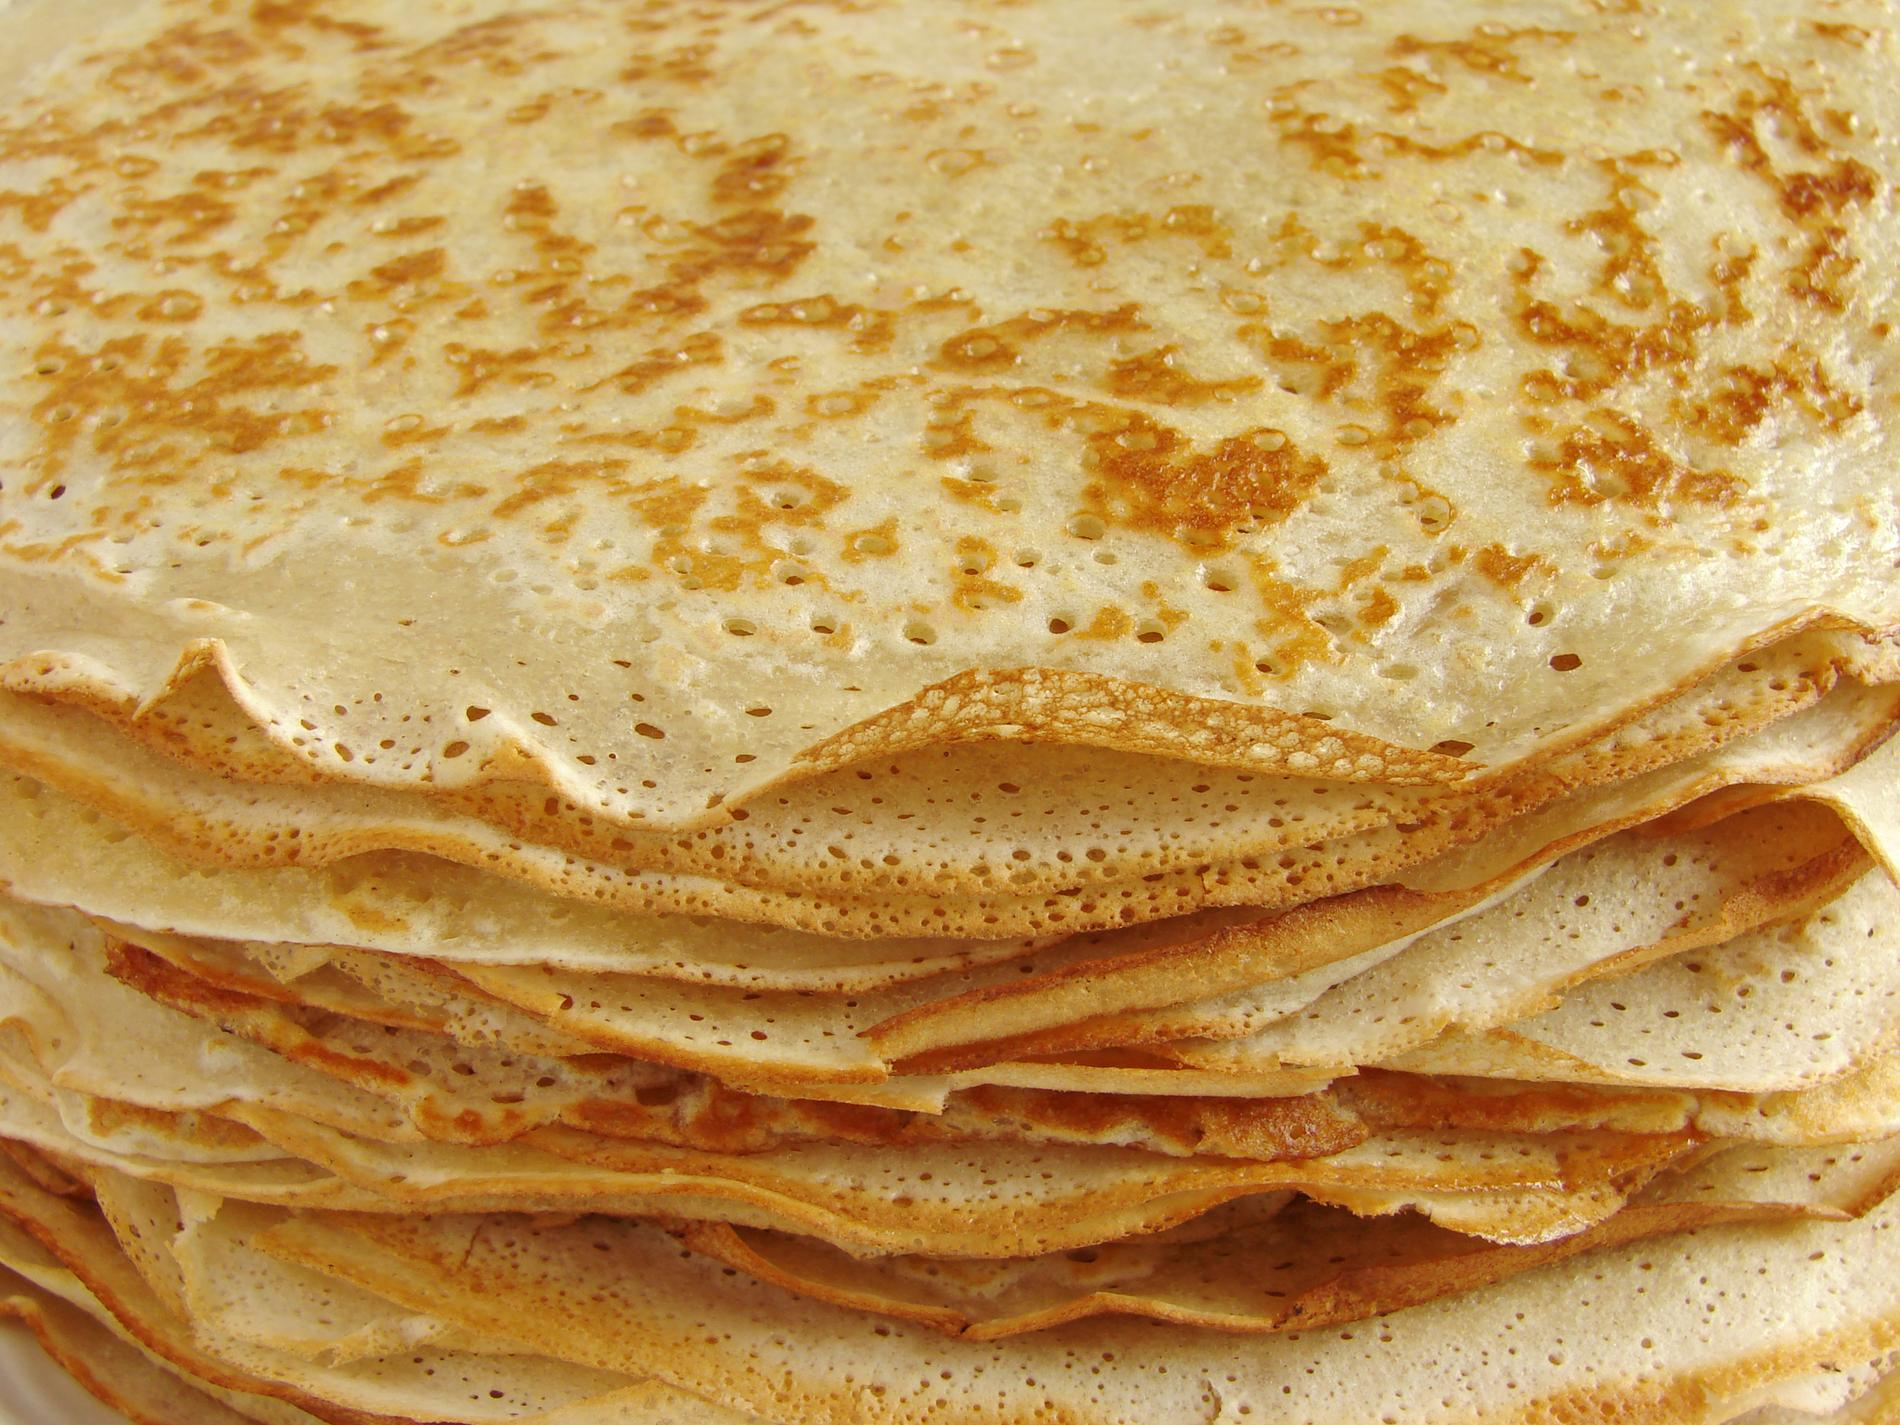 Recette Pate A Crepes Sucree Facile Et Rapide Cuisine Madame Figaro